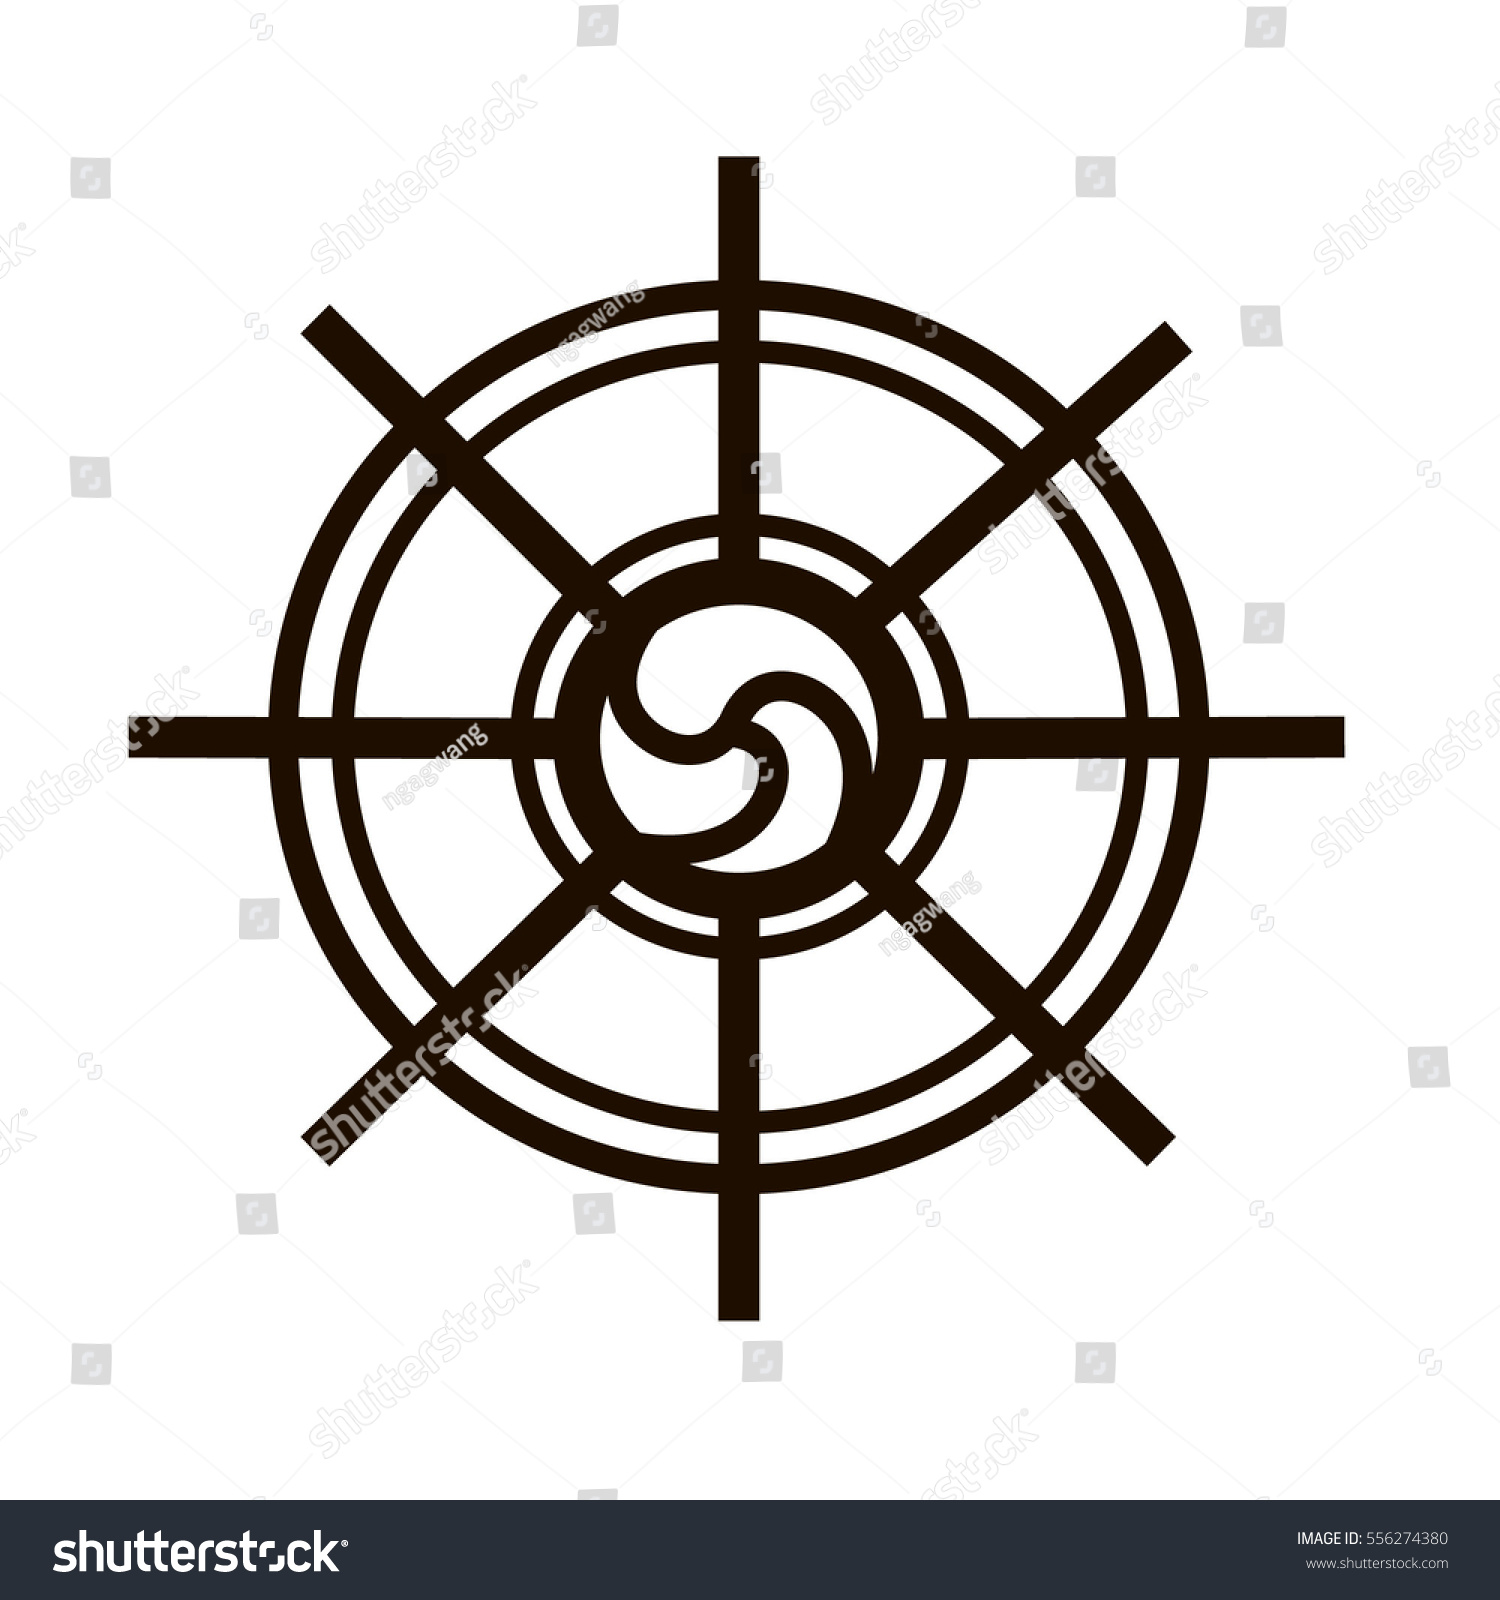 Buddhist symbol dharmachakra stock vector 556274380 shutterstock buddhist symbol dharmachakra biocorpaavc Images